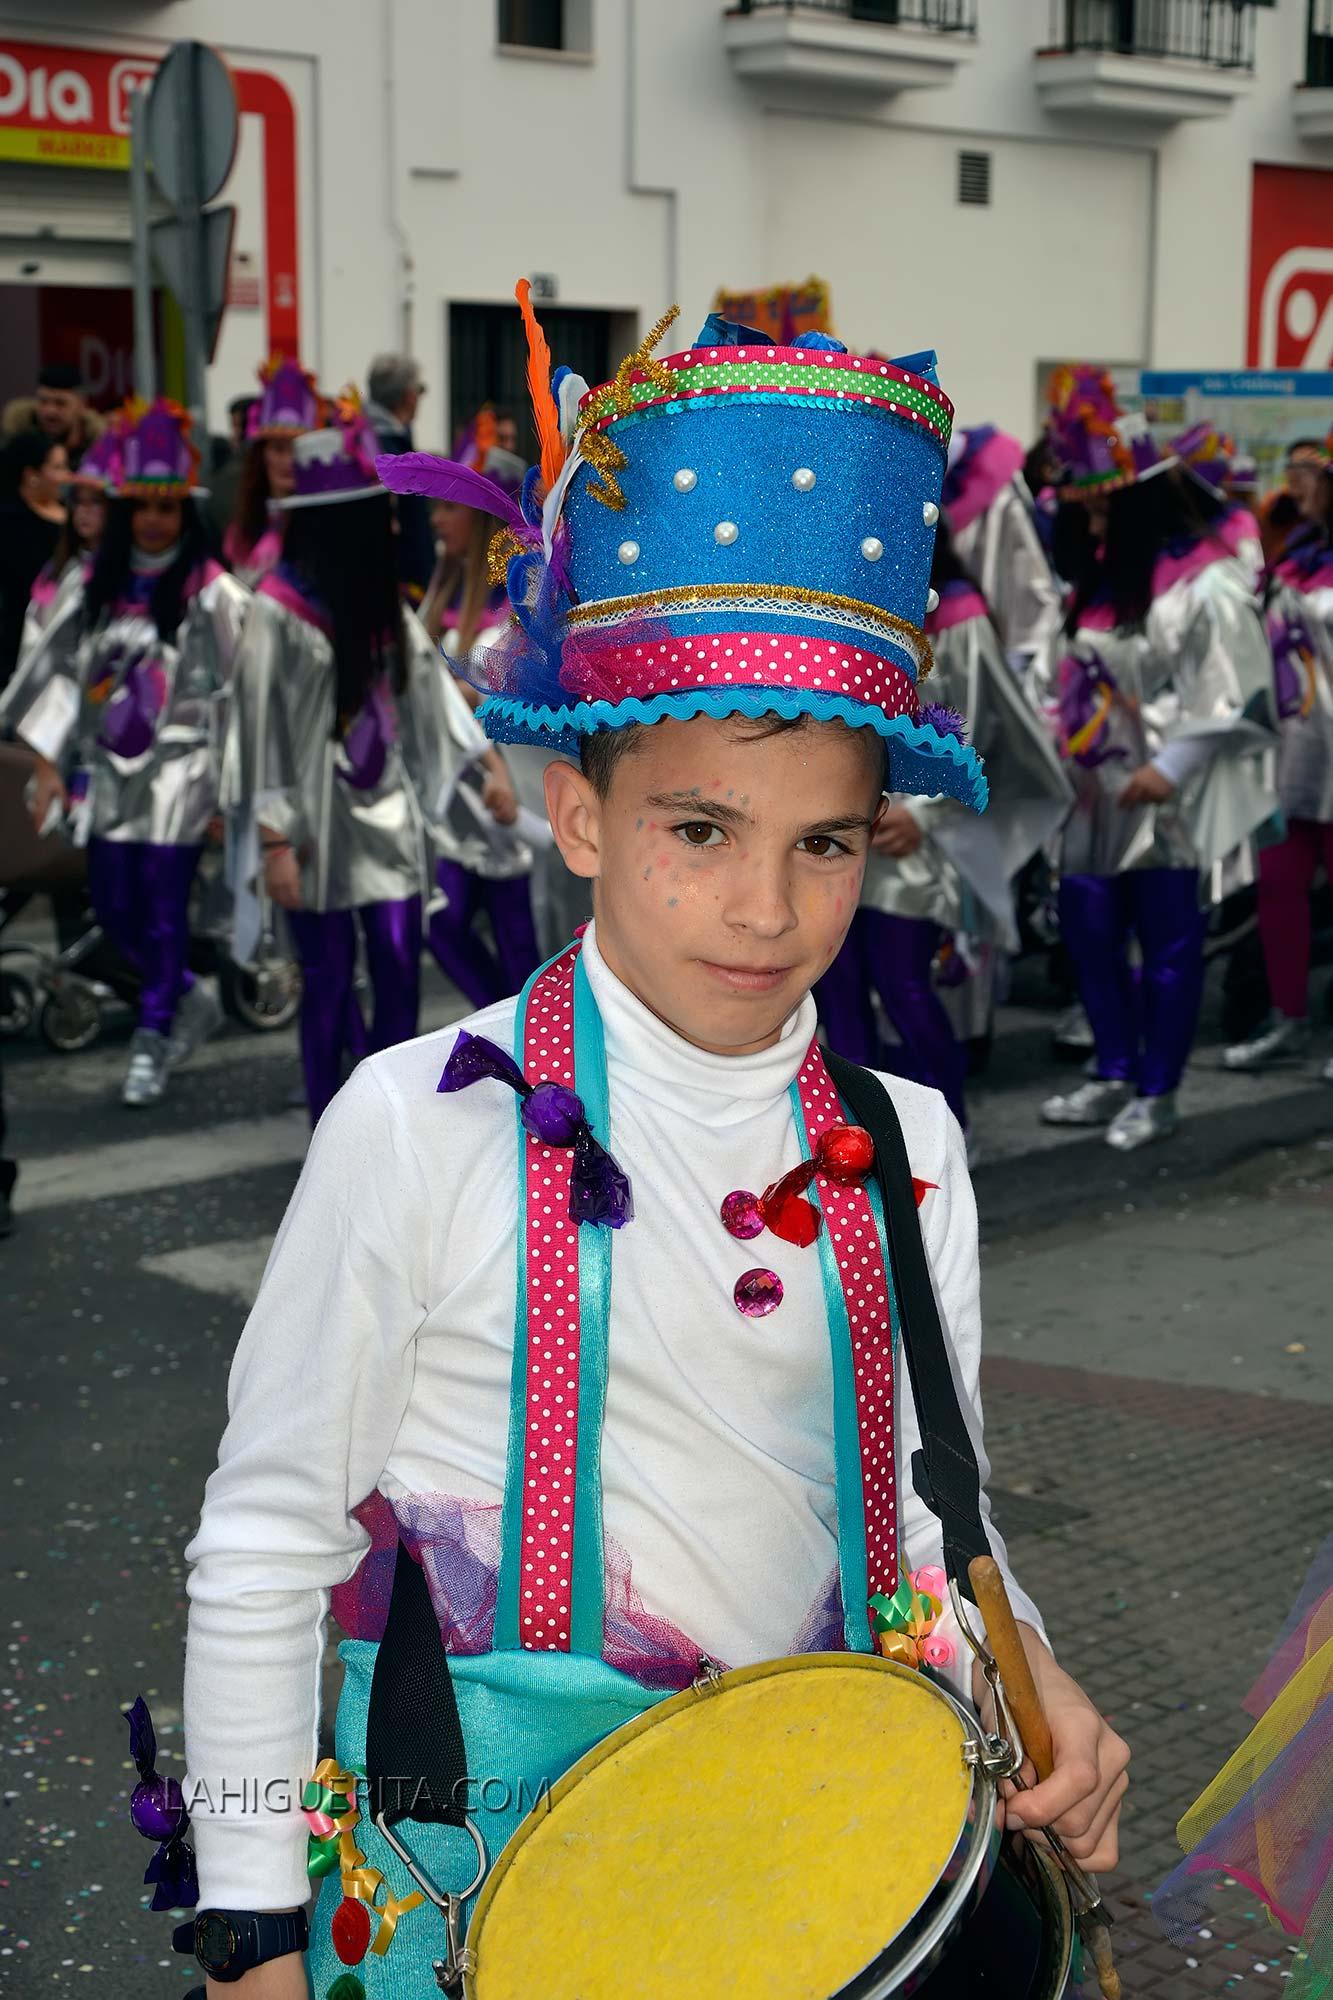 Cabalgata infantil carnaval isla cristina _DSC8201